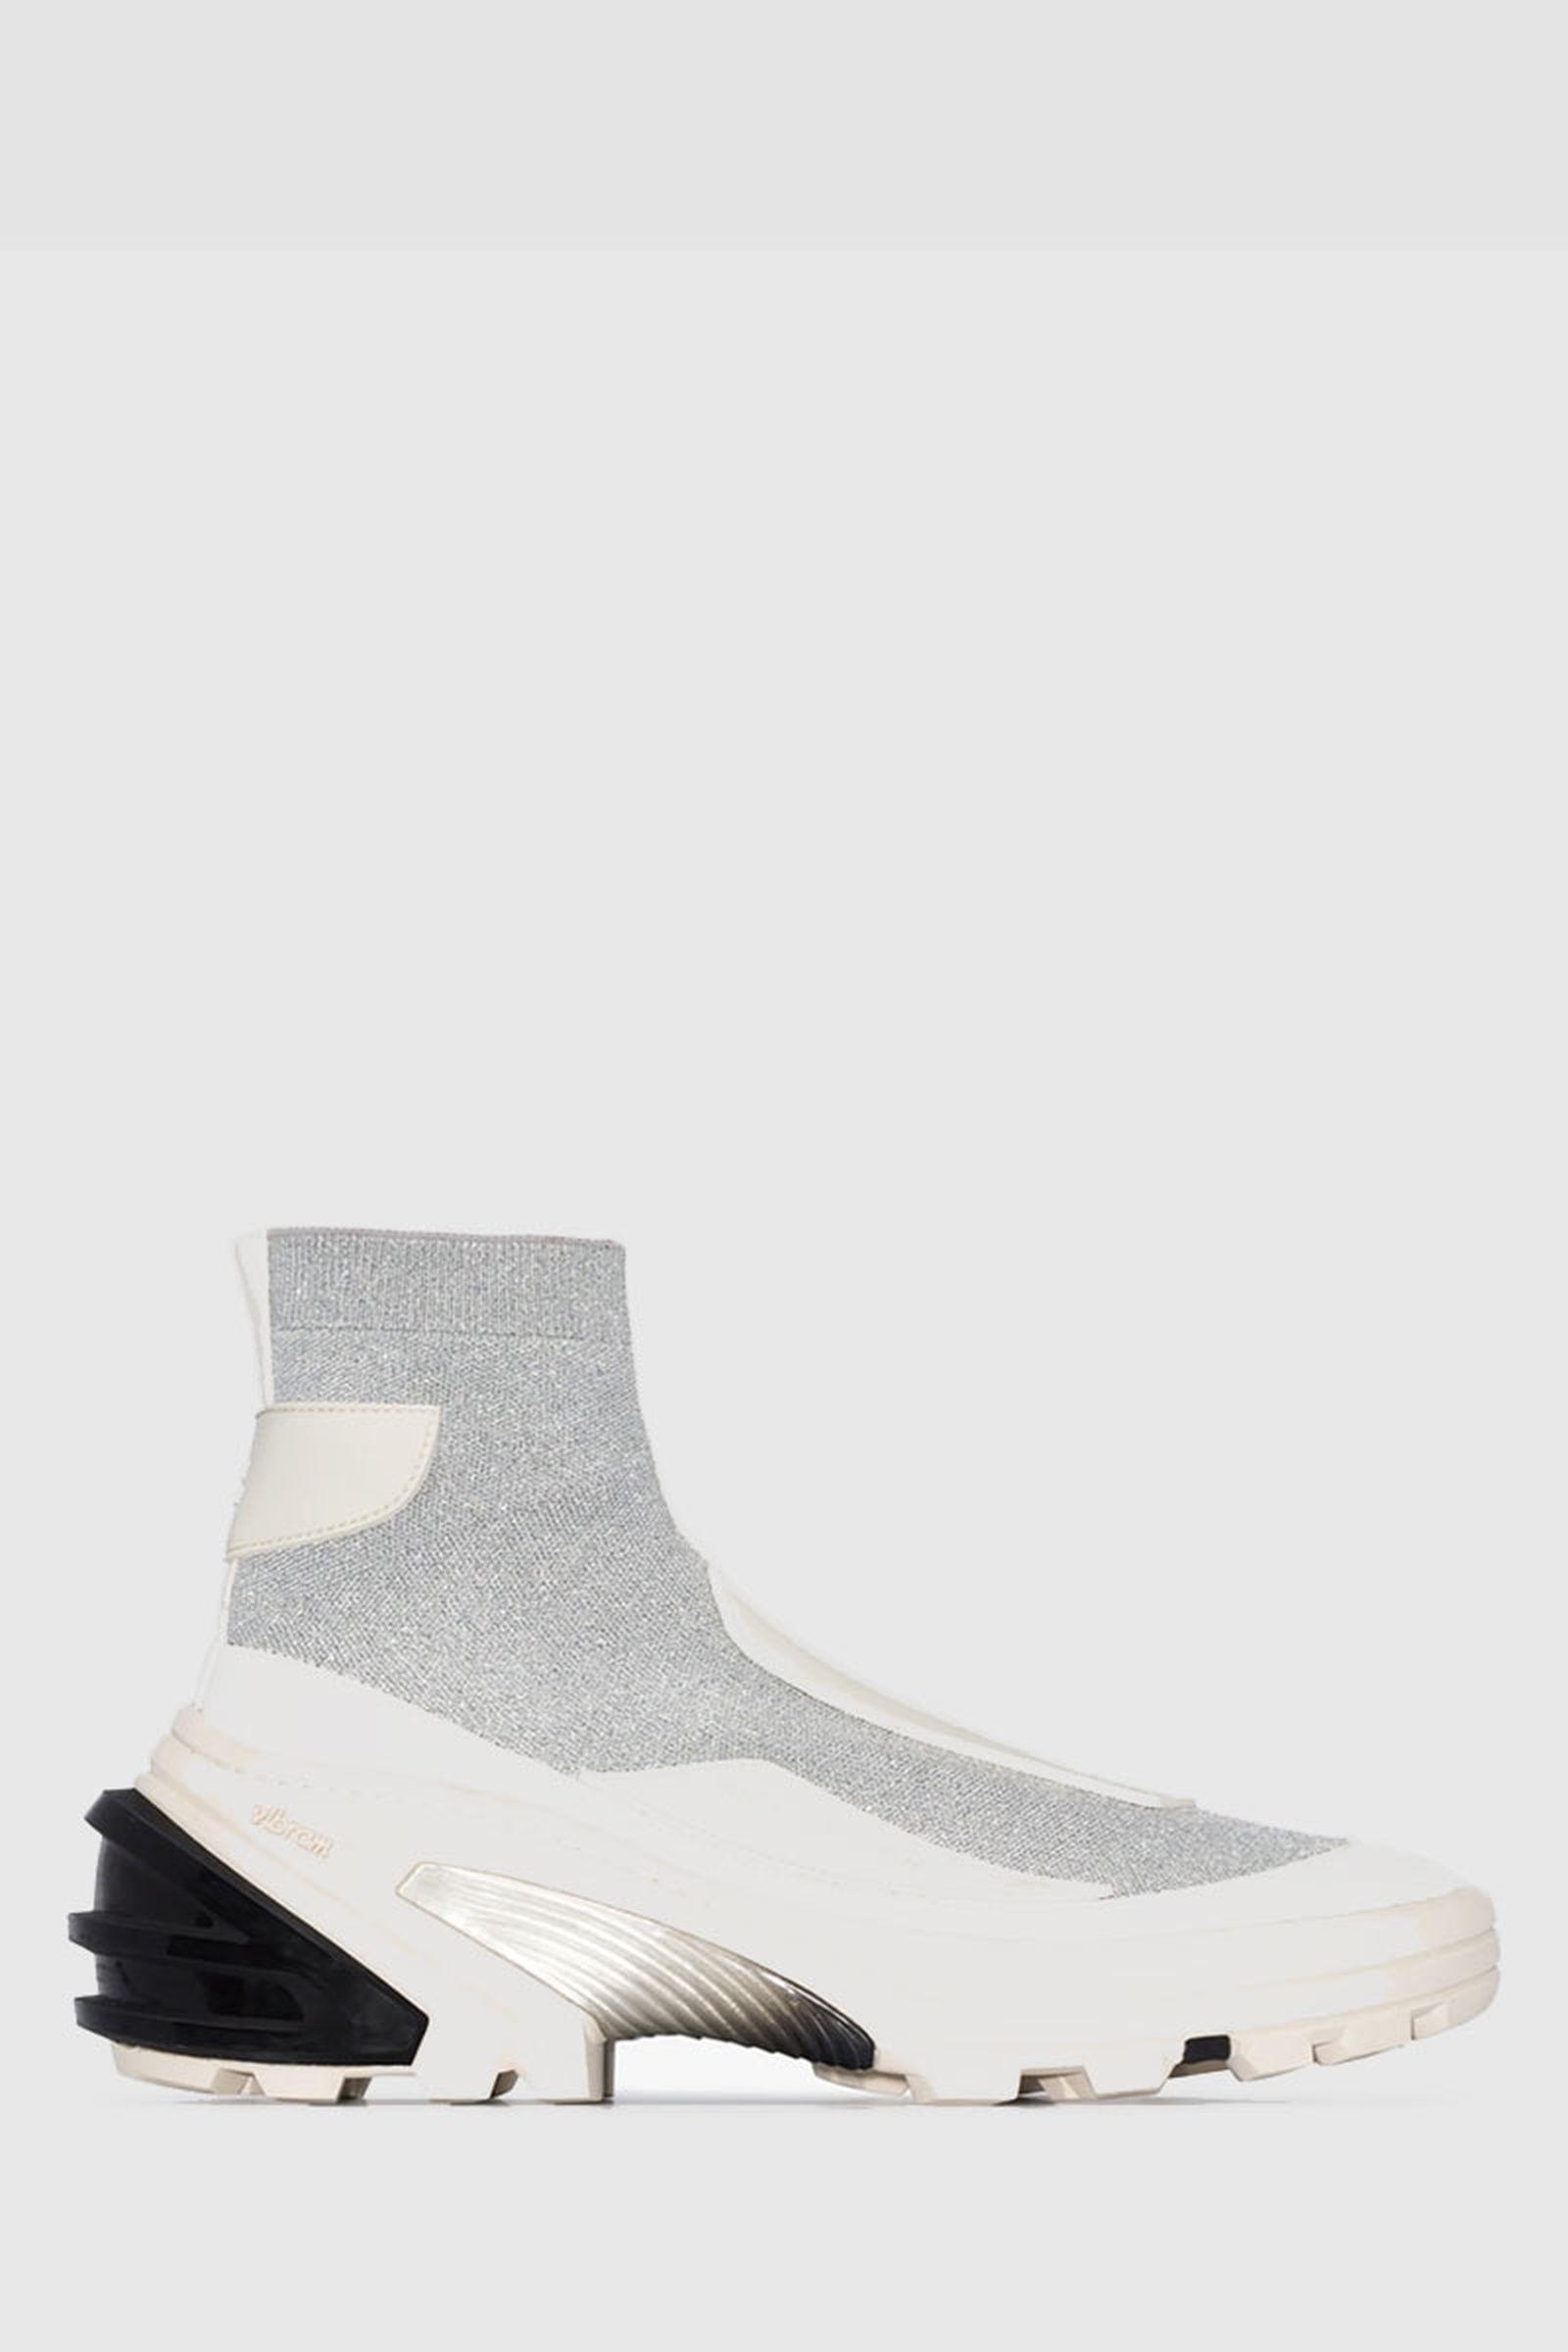 1017 ALYX 9SM knit shoes